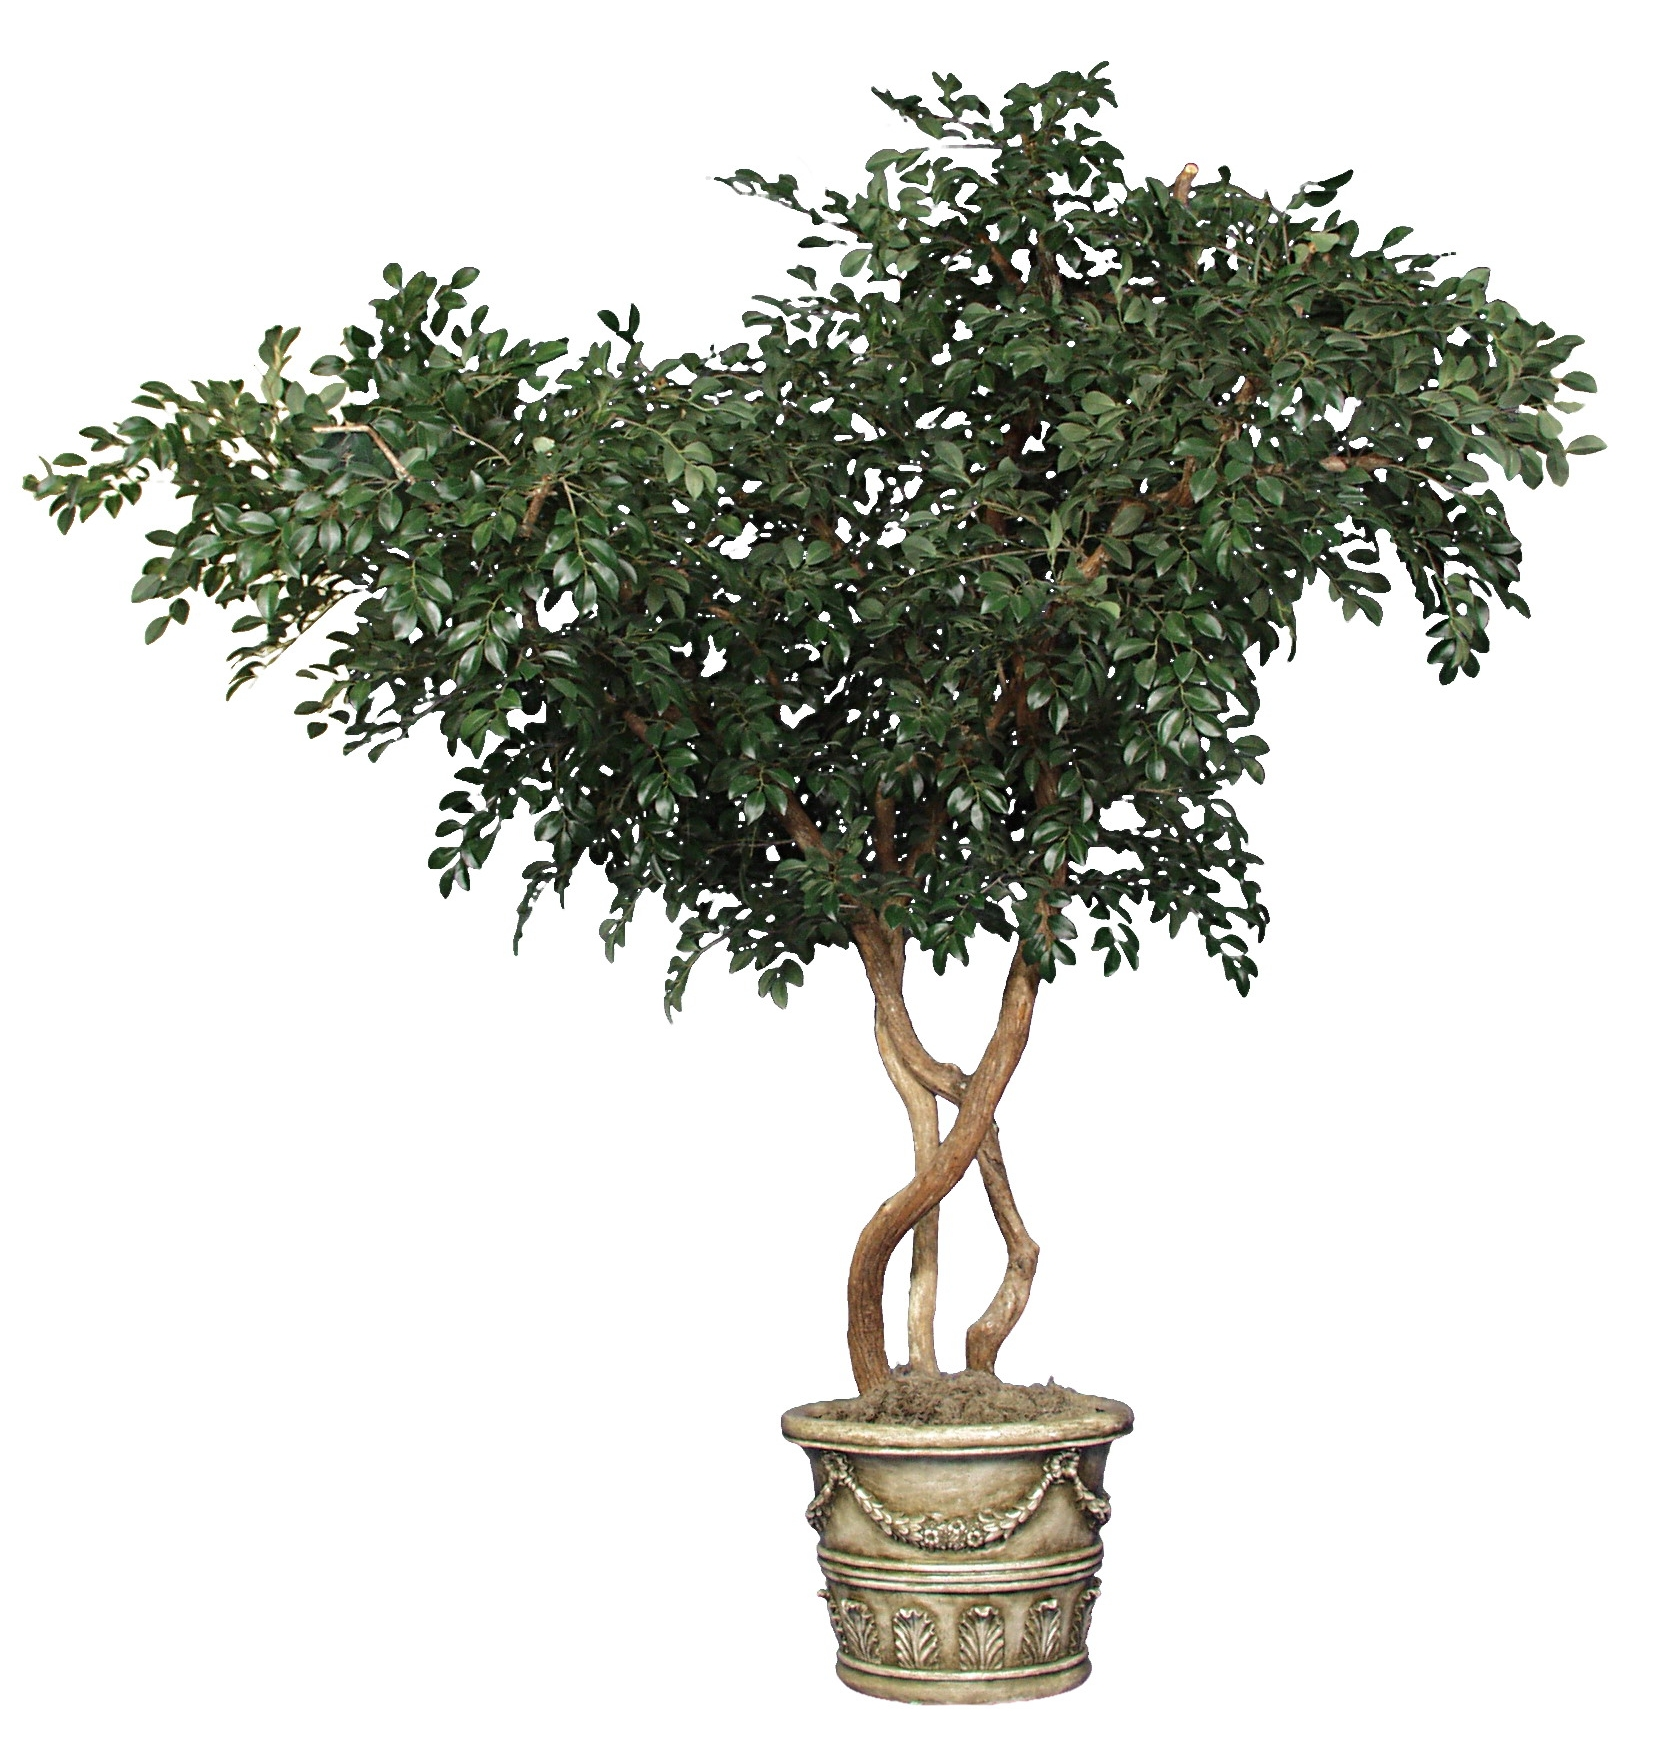 TCM 2272- Sacagi Ficus